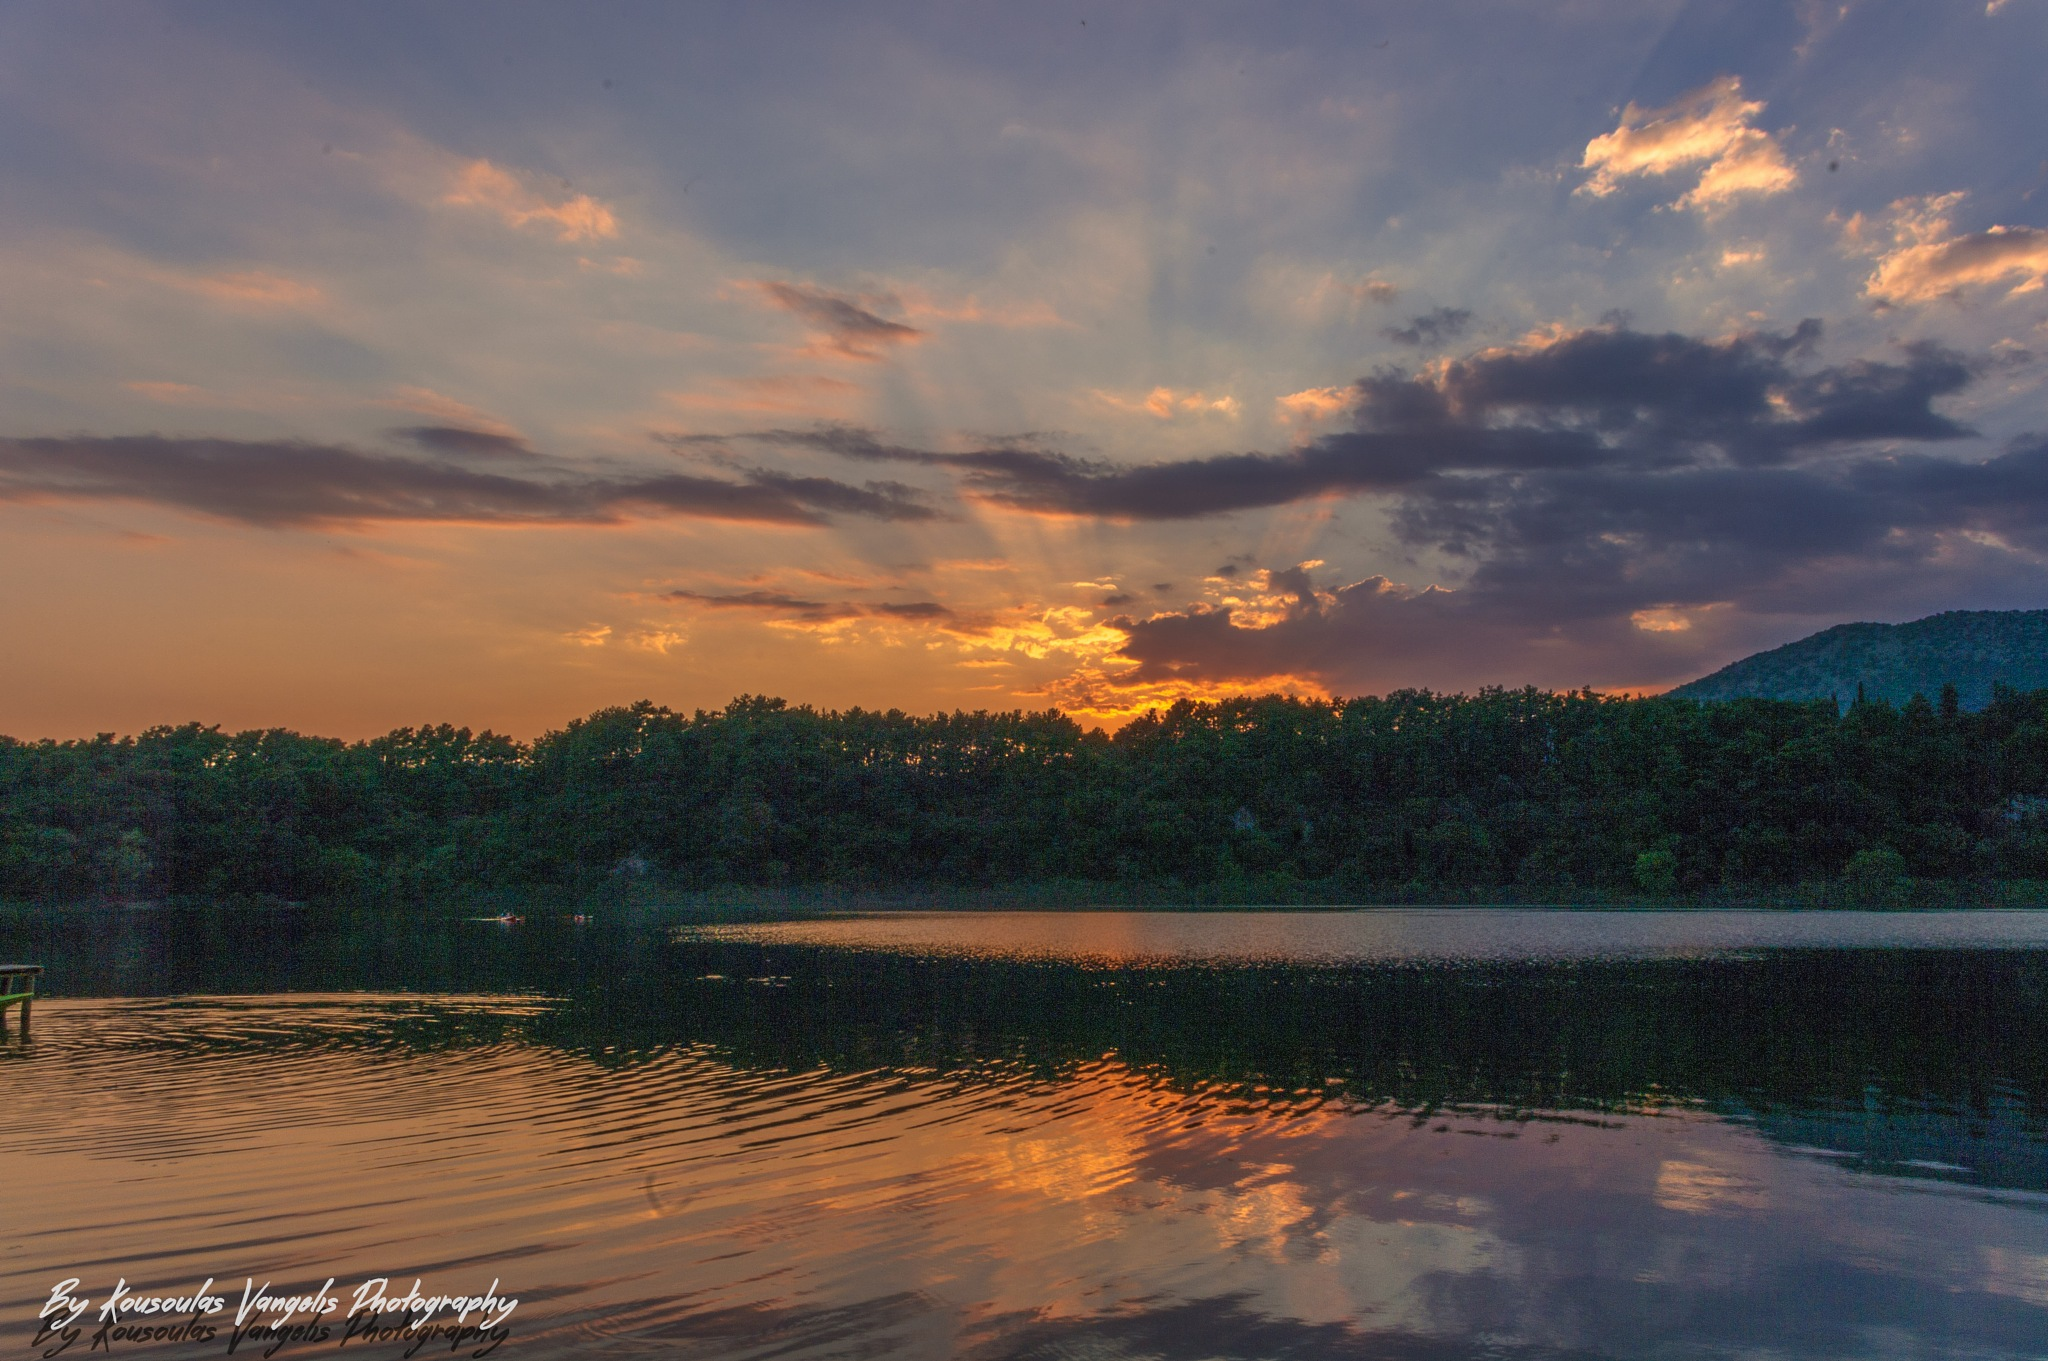 Sunset lake Ziros by kousoulas vangelis